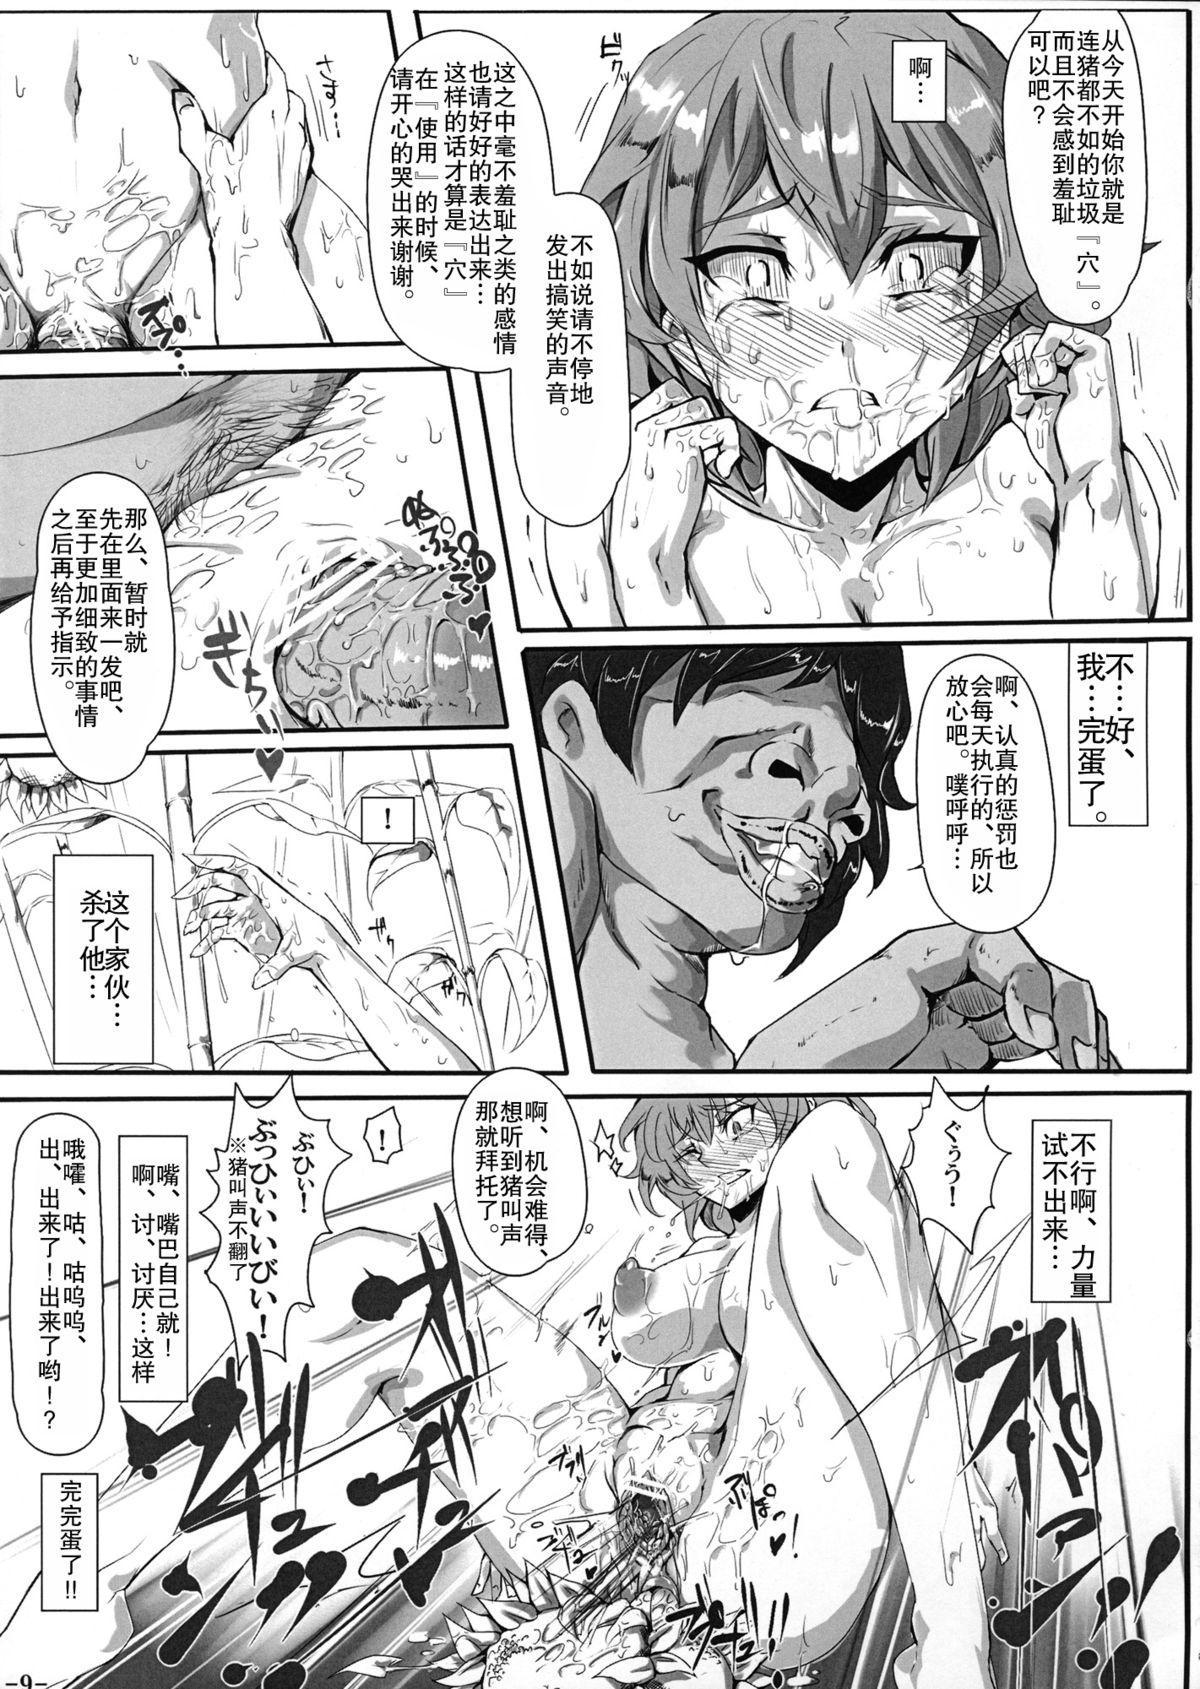 (Reitaisai 10) [Nyuu Koubou (Nyuu)] Saimin Nante Kakaranai!!! (Touhou Project)) [Chinese] [后悔的神官个人汉化] 10